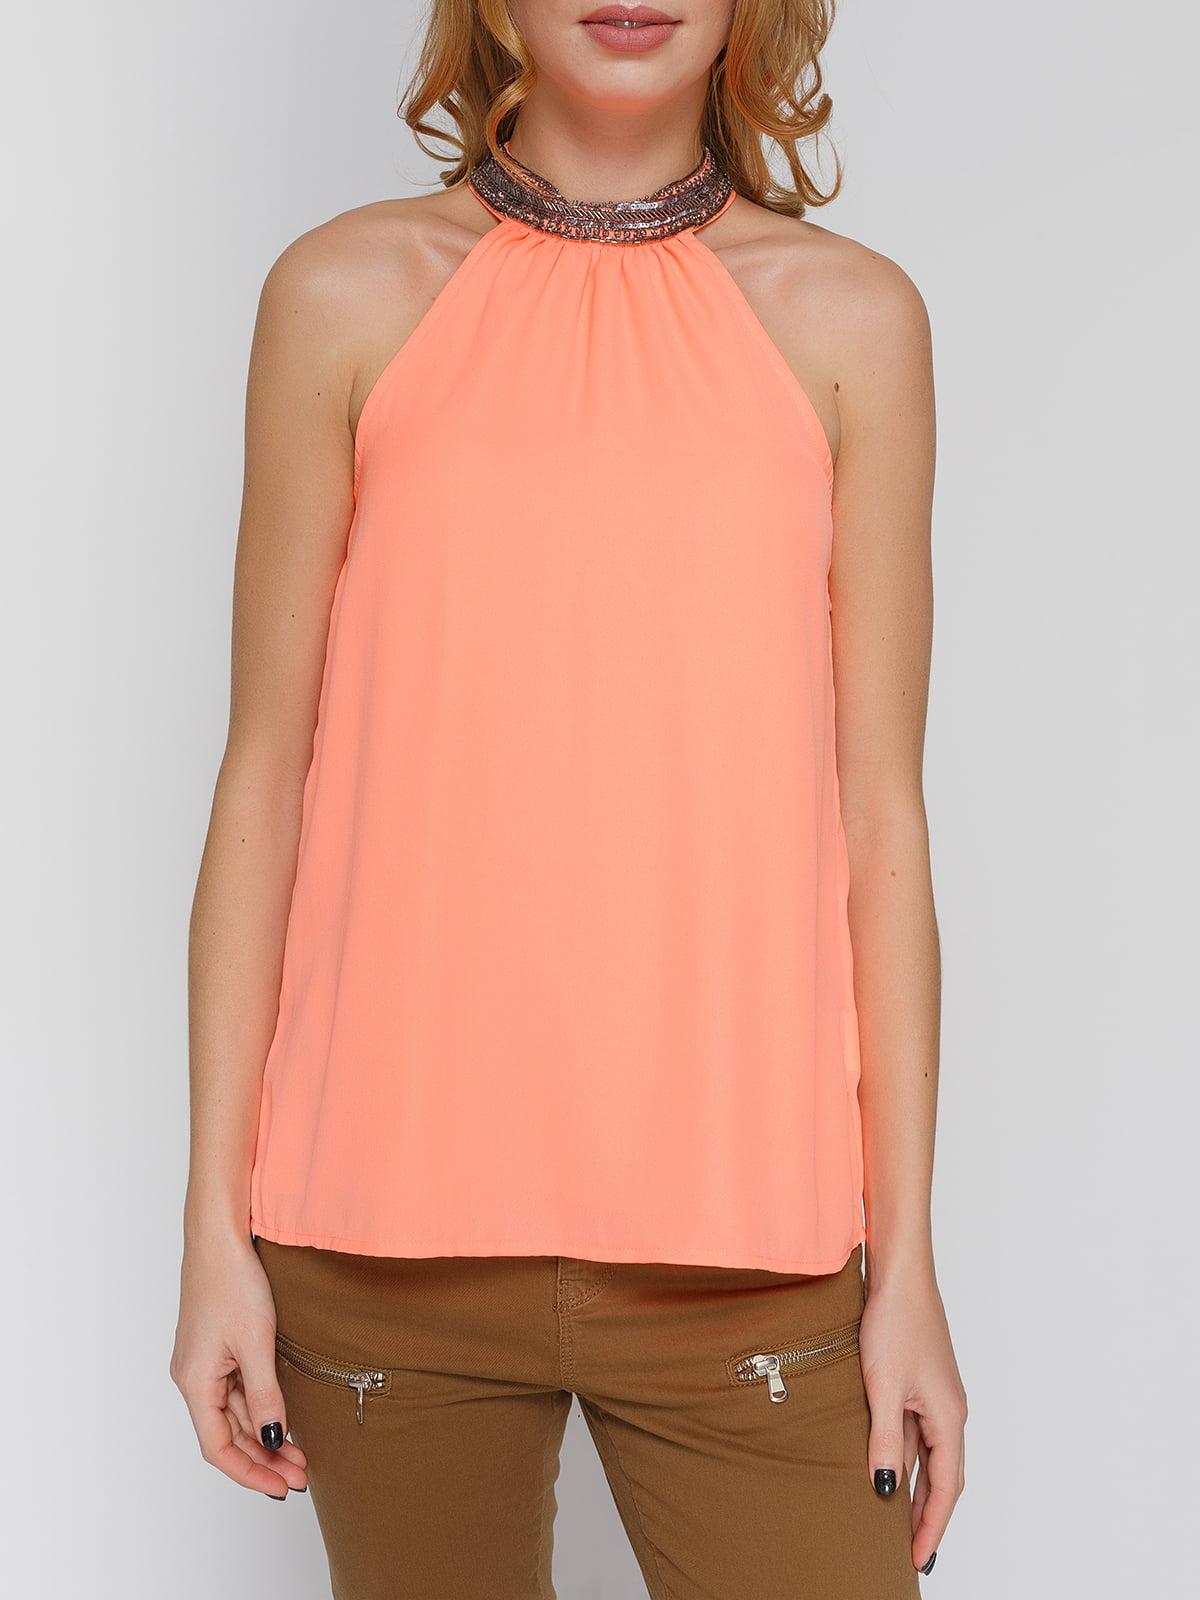 Блуза персикового цвета   4628343   фото 3